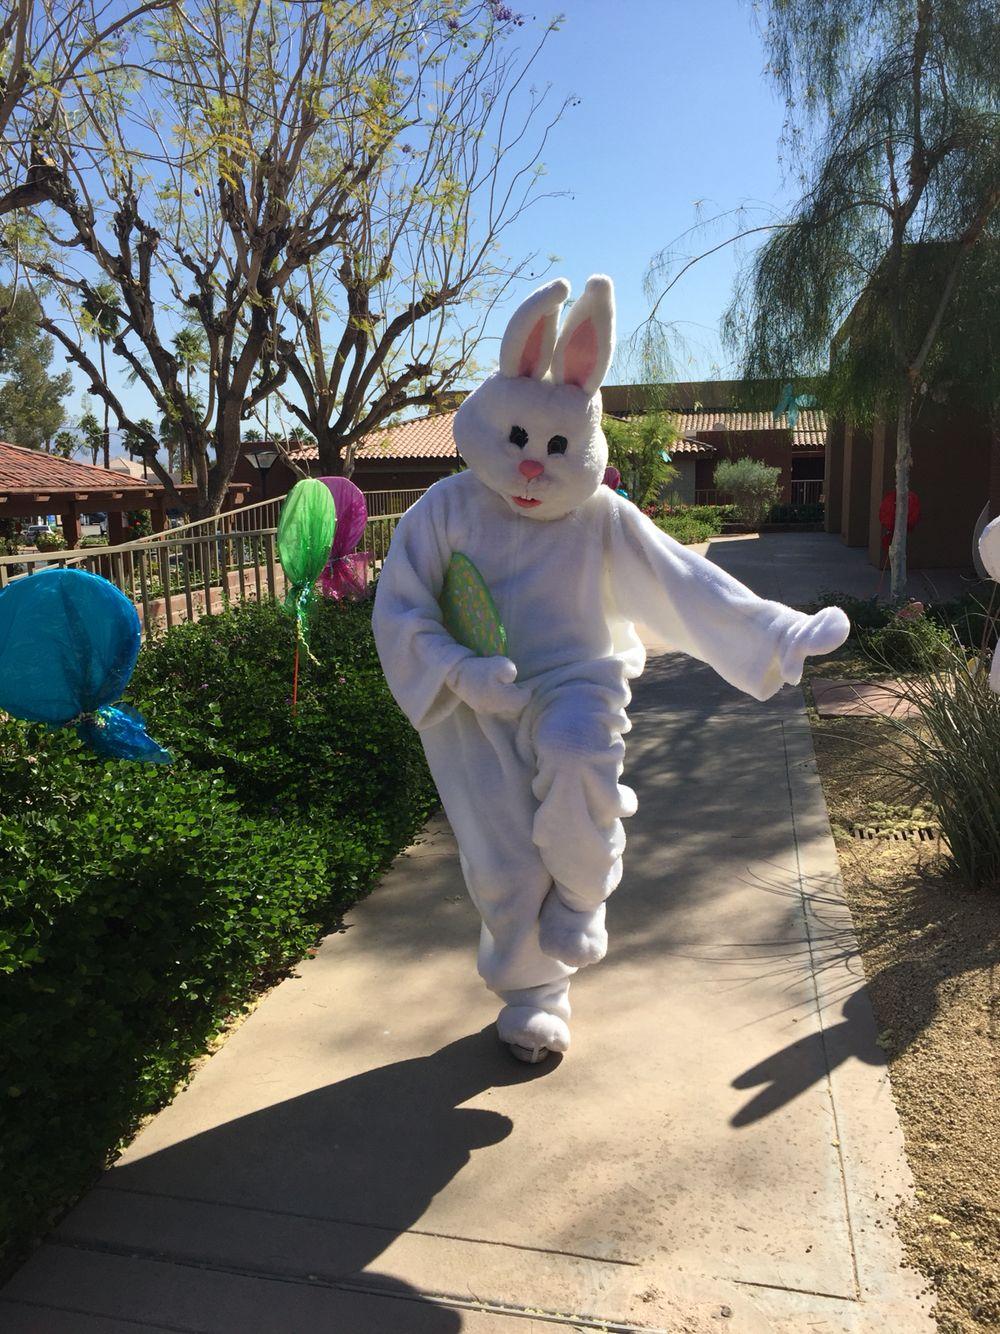 Bunny heisman pose... Happy Easter